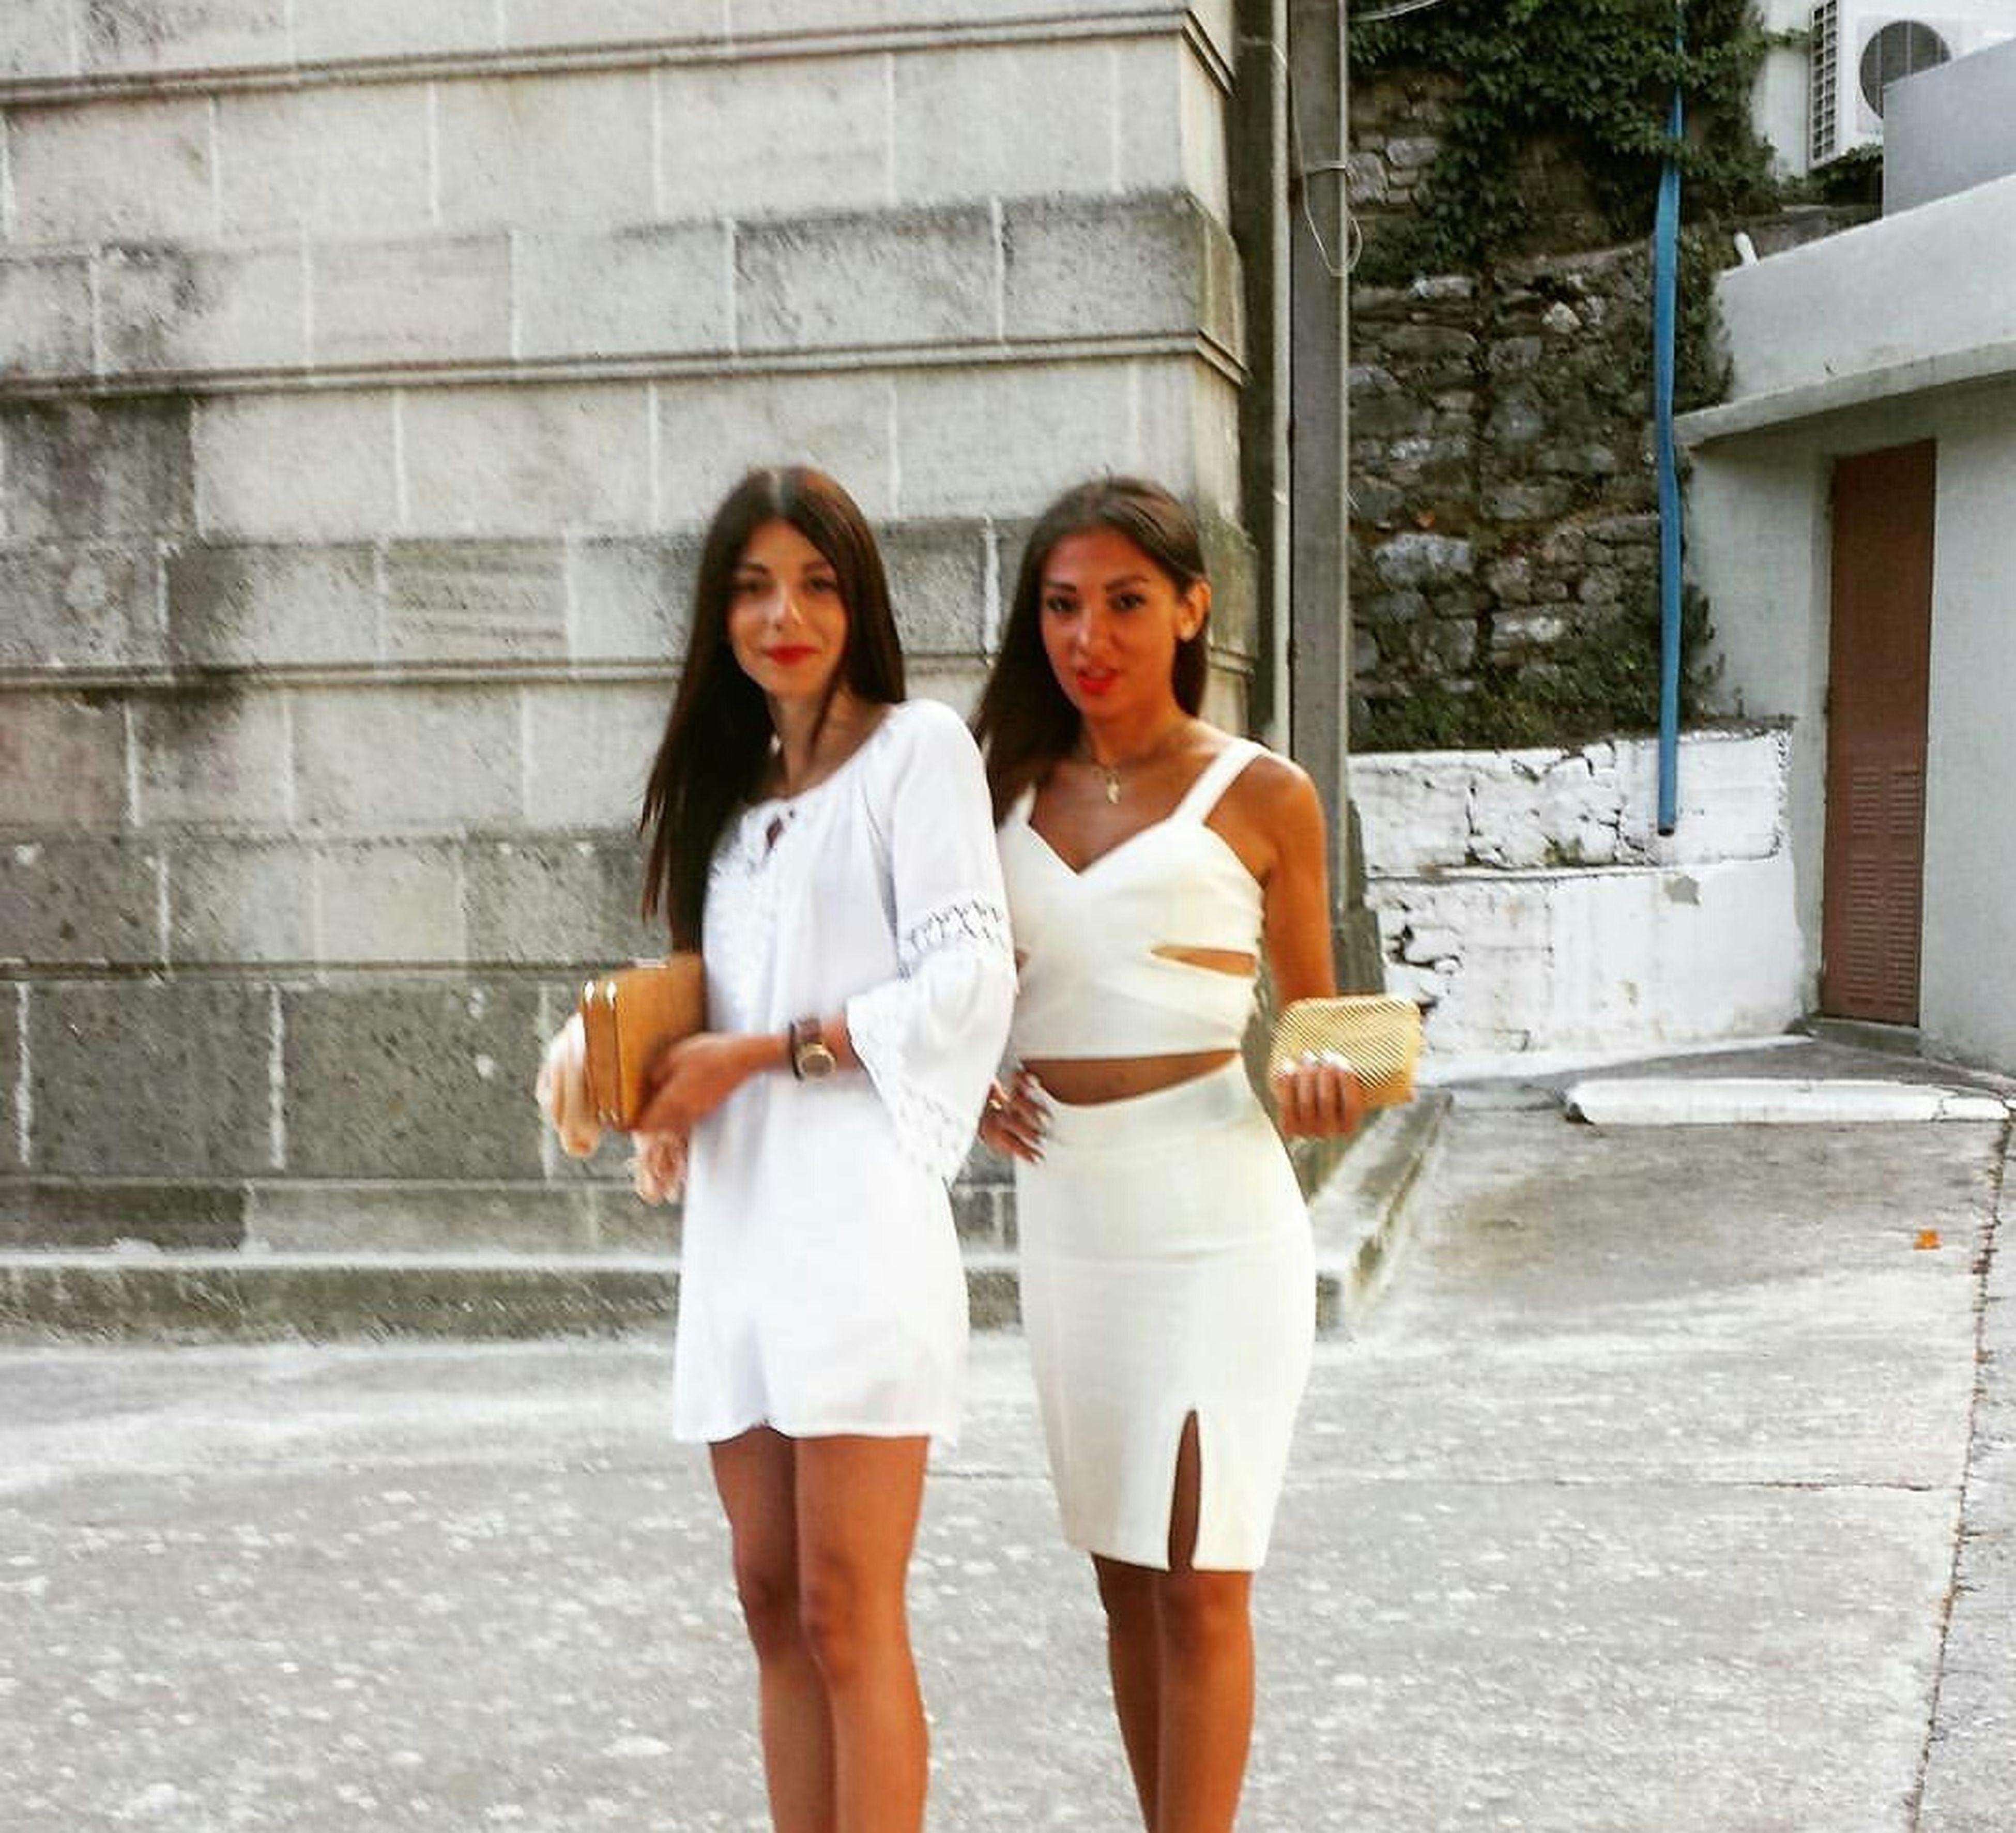 Greece Wedding Photoshooting Self Portrait Faces Of EyeEm EyeEm Best Shots OpenEdit Vacation People Hello World